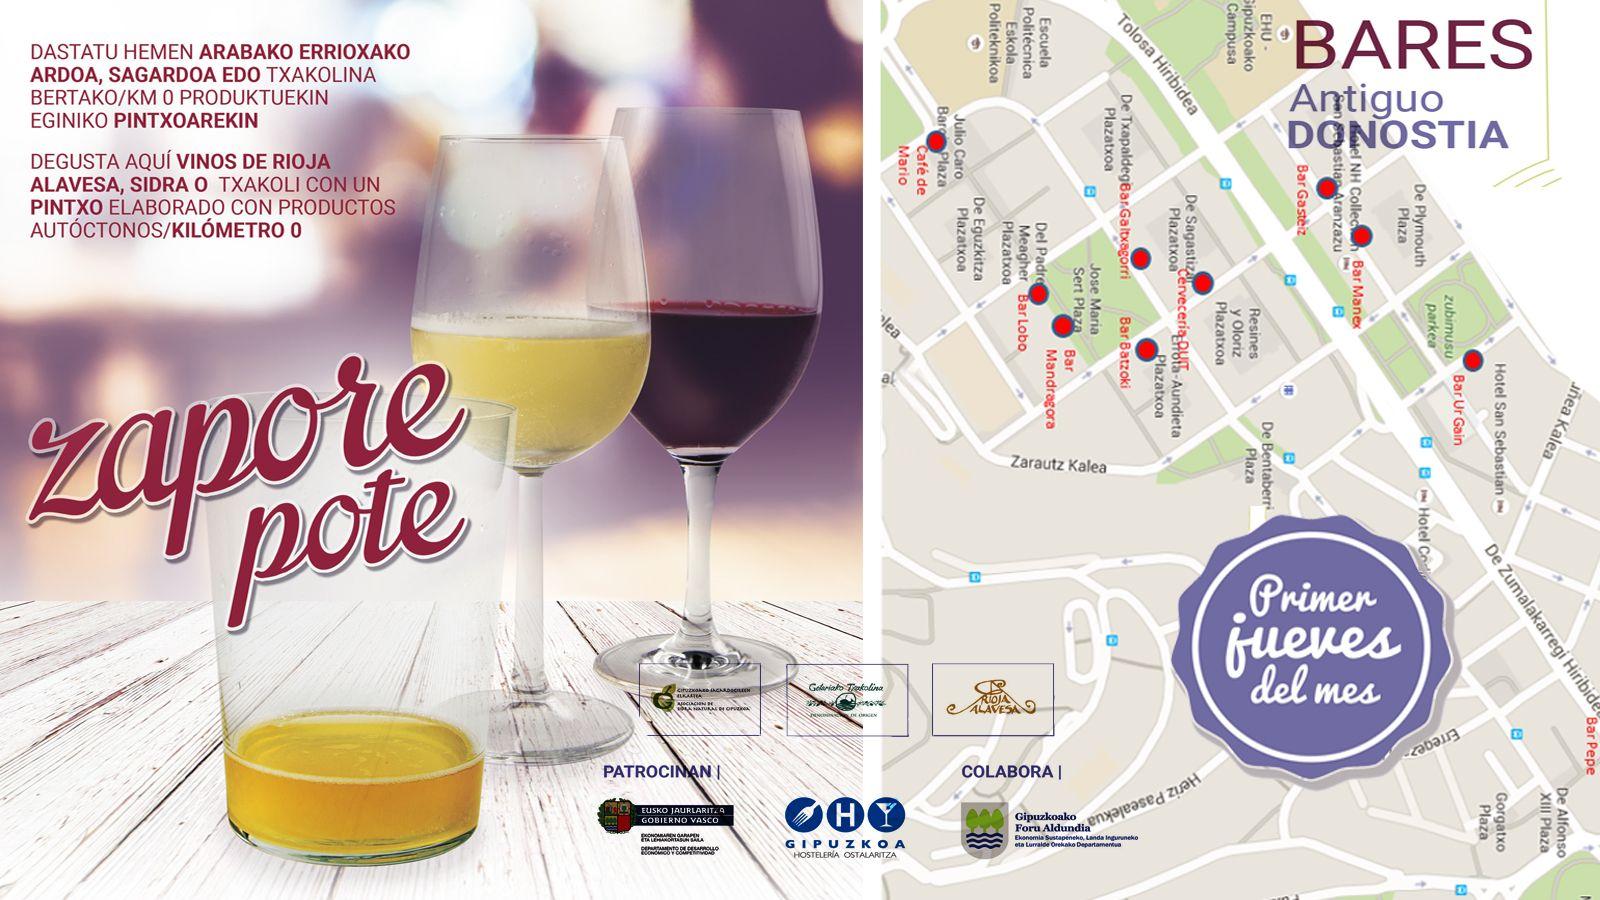 Hoy, ZaporePote, primer jueves de mes en el Antiguo. #Donostia #Hosteleria #Kalitatea #febrero2016 http://bit.ly/1SY1bwQ